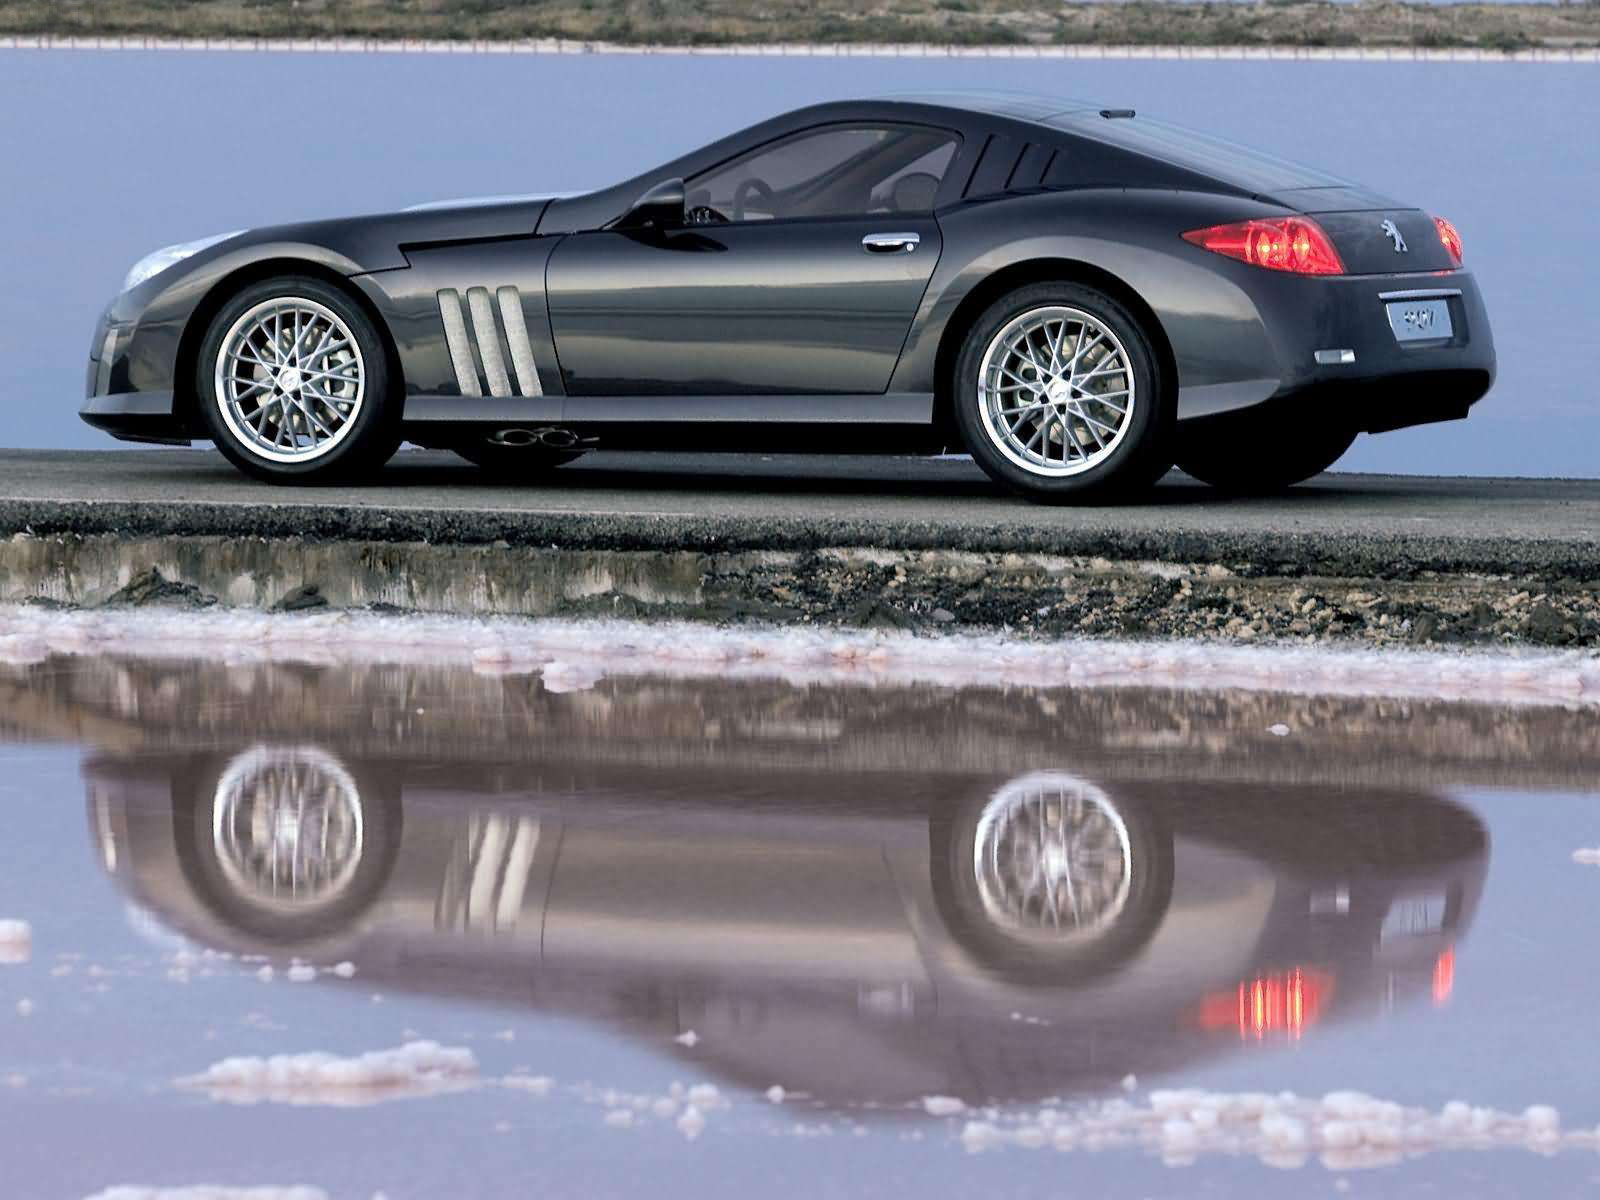 http://3.bp.blogspot.com/_DEP49tusZwg/TP2xF7IsYQI/AAAAAAAAChM/cVZ6LbfH_Hs/s1600/Peugeot_907_Concept_10.jpg